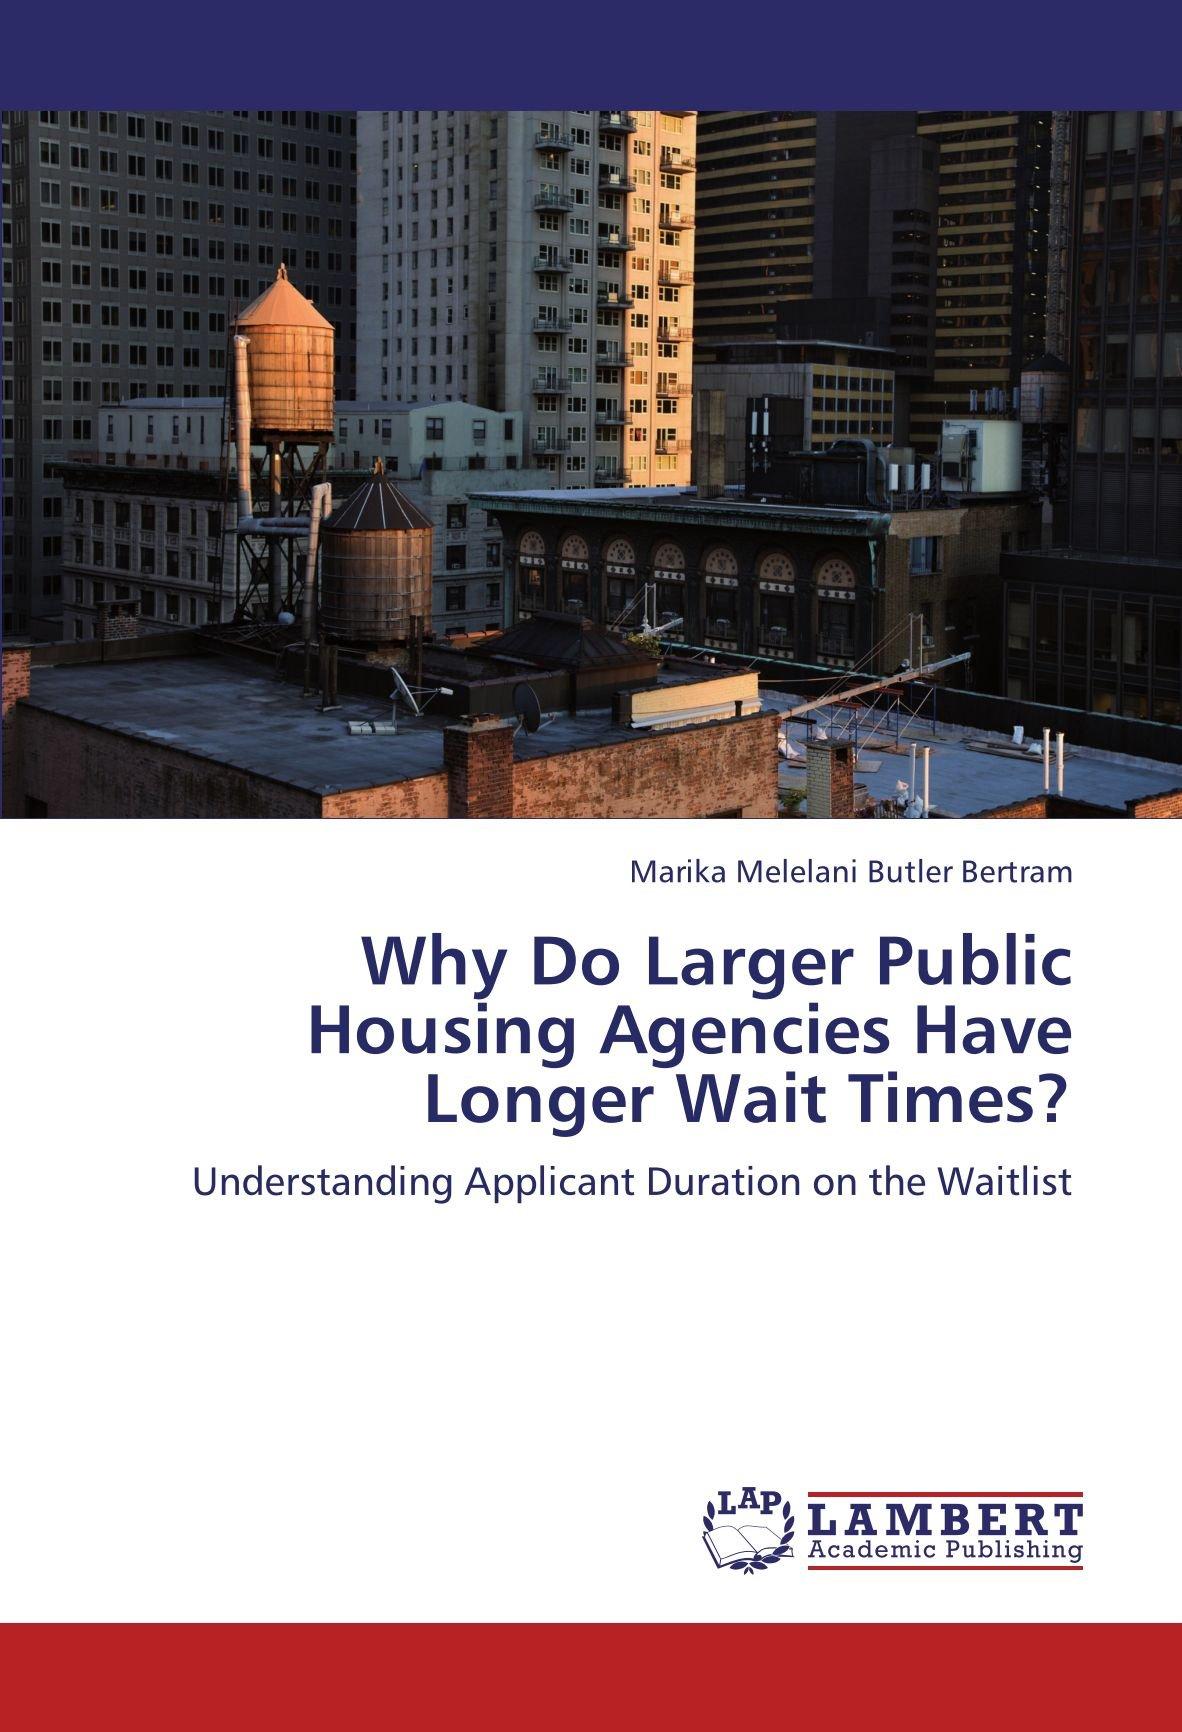 Why Do Larger Public Housing Agencies Have Longer Wait Times